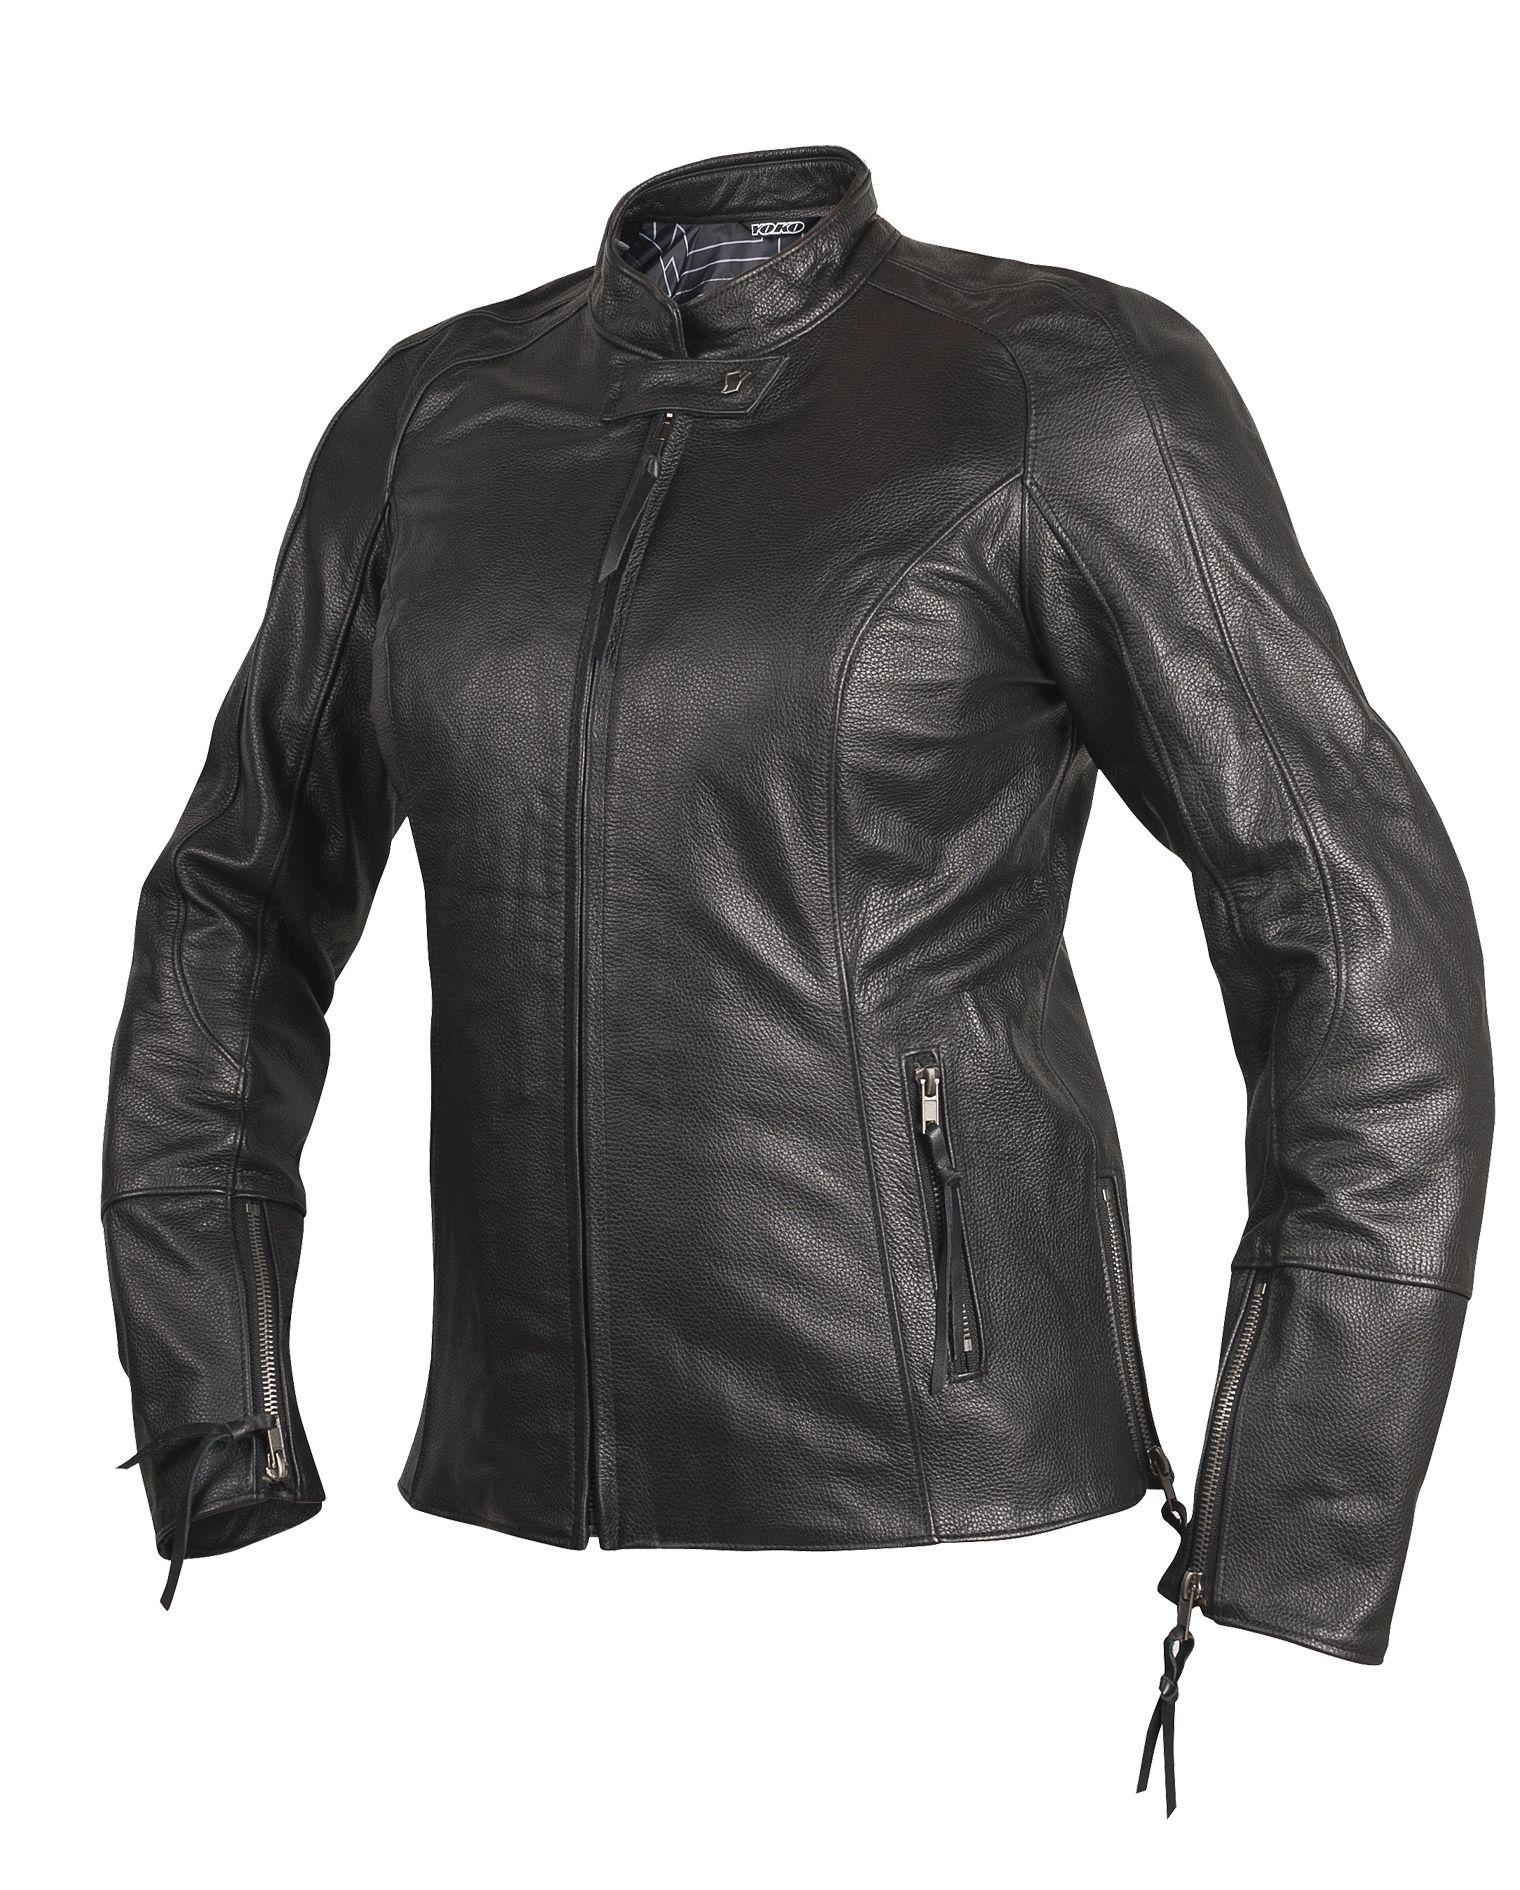 Yoko motorcycle gloves - Yoko Dama Black Motorcycle Jacket For Women Looks Actually Quite Nice No Cheesy